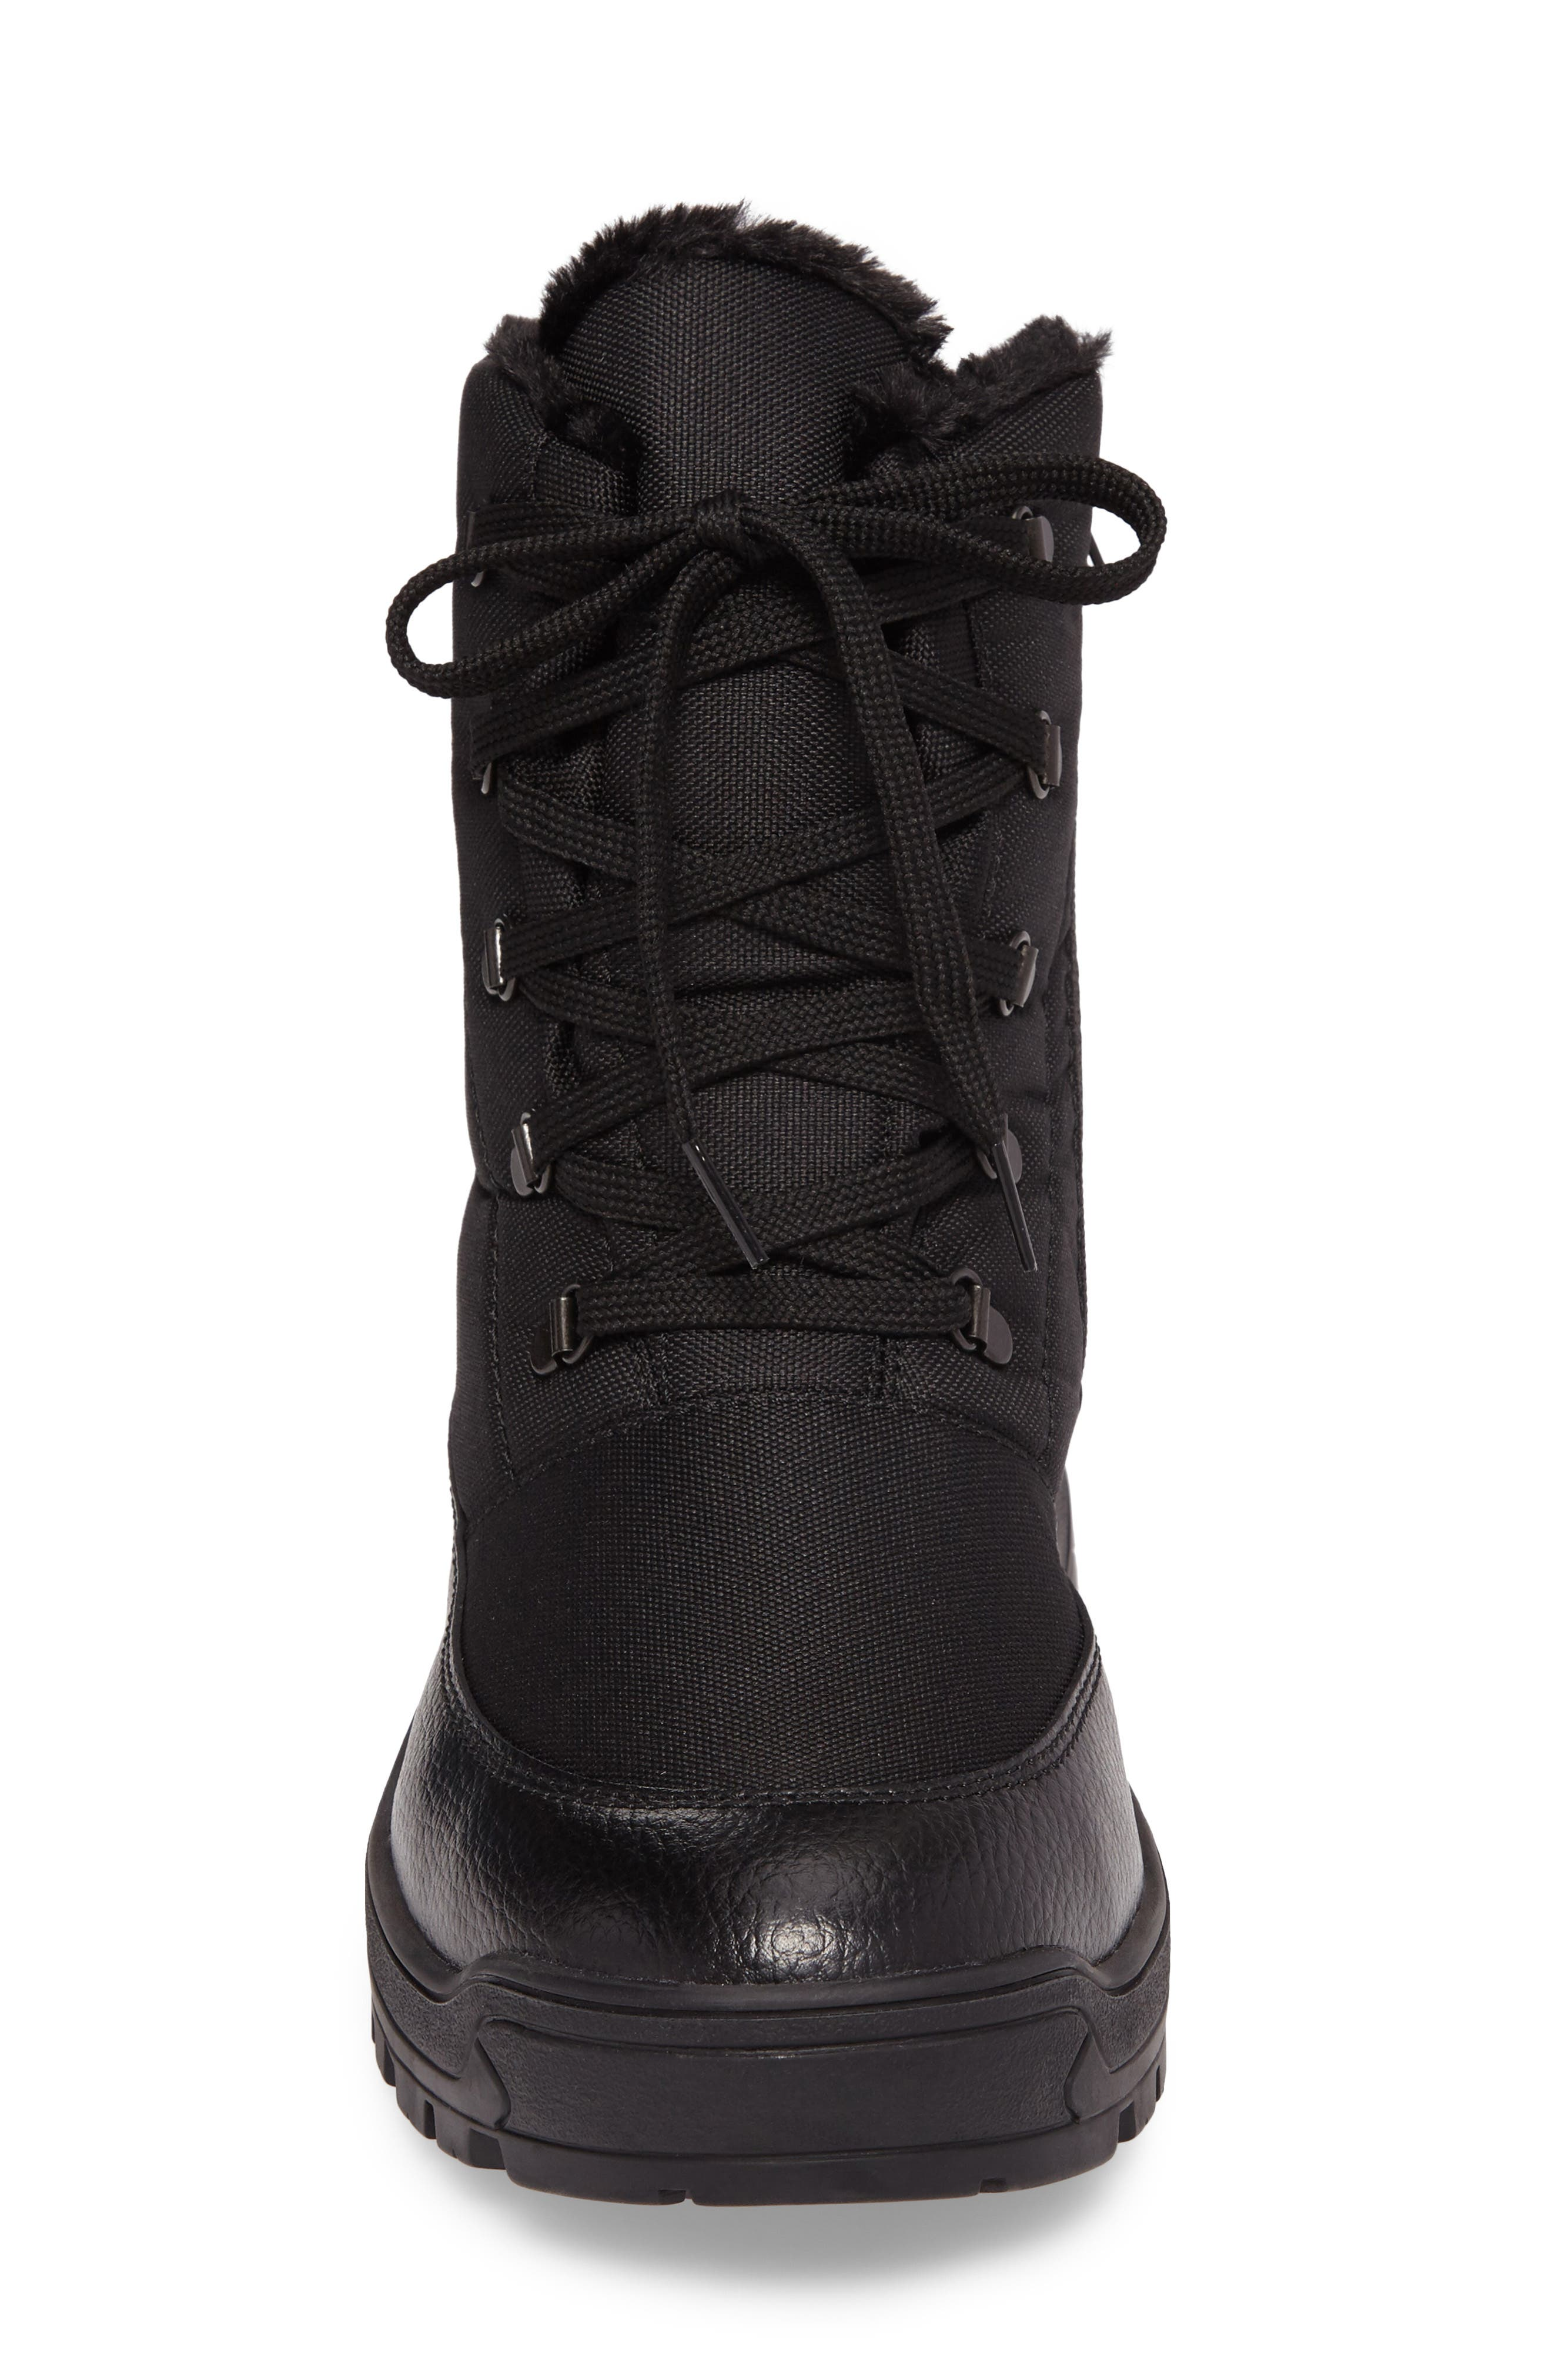 Trigger Winter Boot,                             Alternate thumbnail 4, color,                             Black